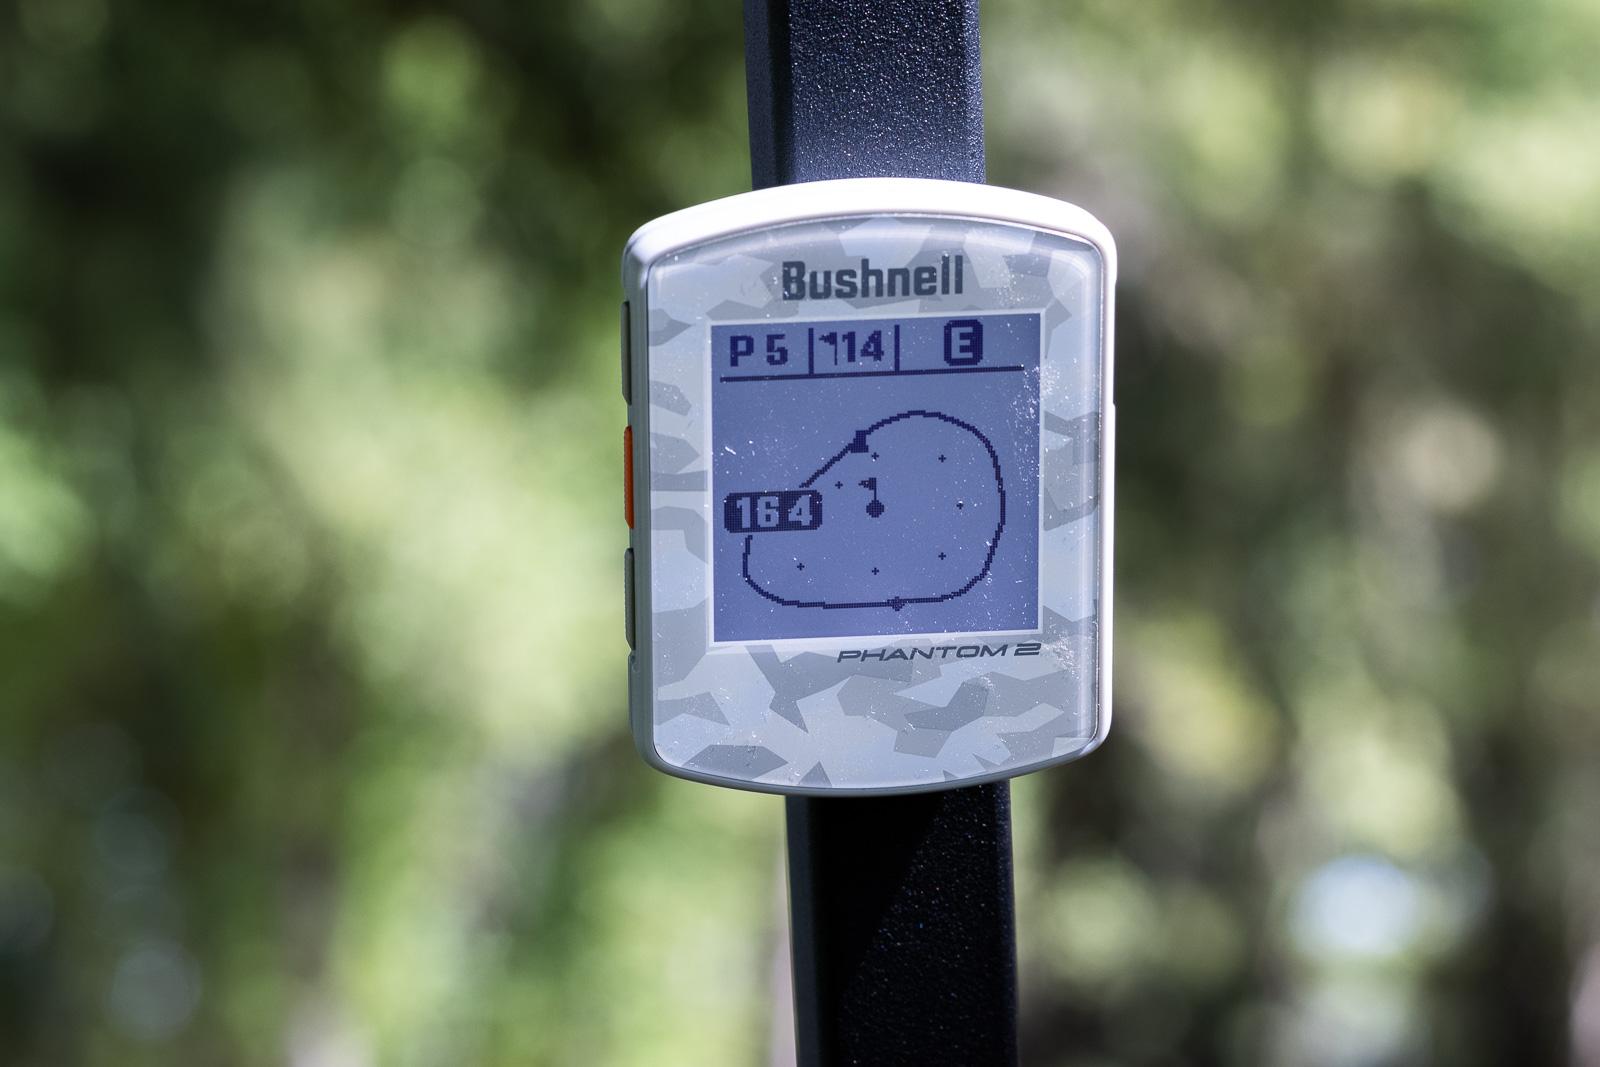 Bushnell Golf Phantom 2 GPS